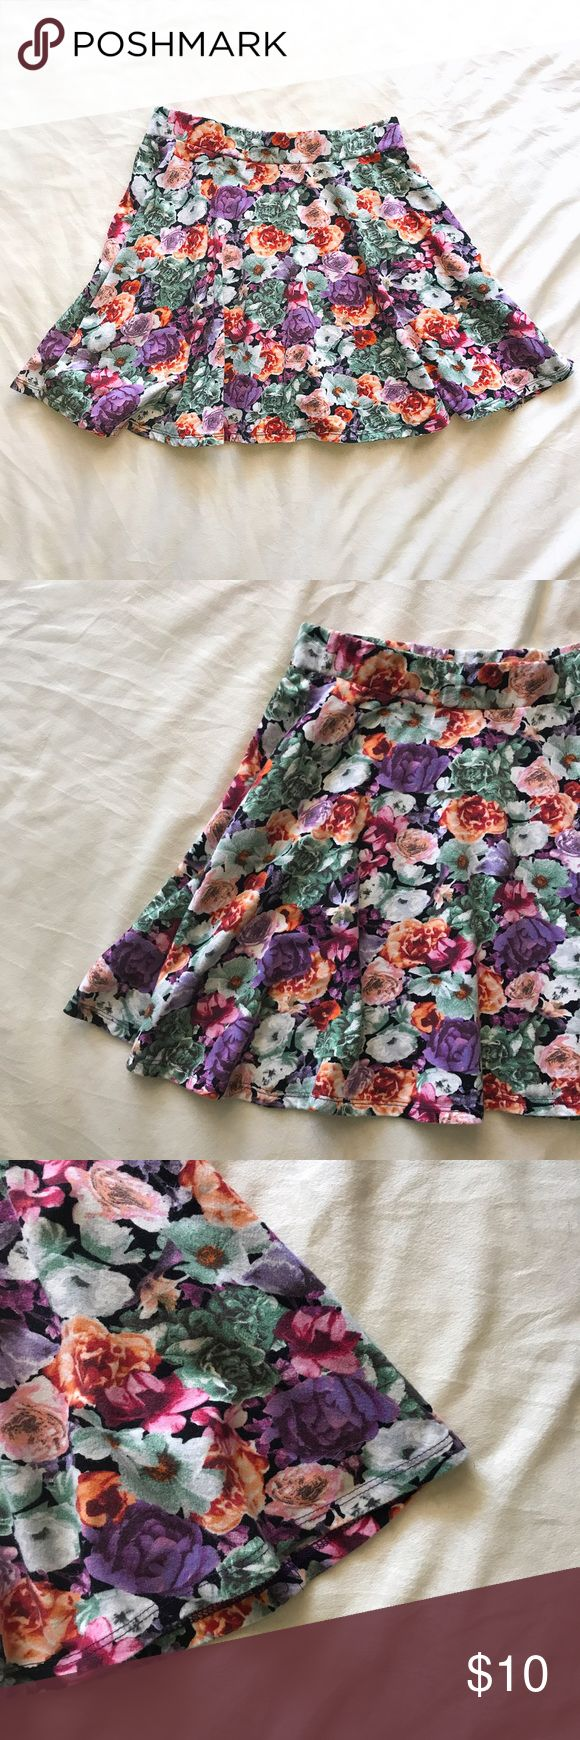 "Floral Mini Circle Skirt Beautiful floral print circle skirt featuring floral print and an elastic waistband. 15"" long, 27"" waistband. Ships next day. Skirts Mini"